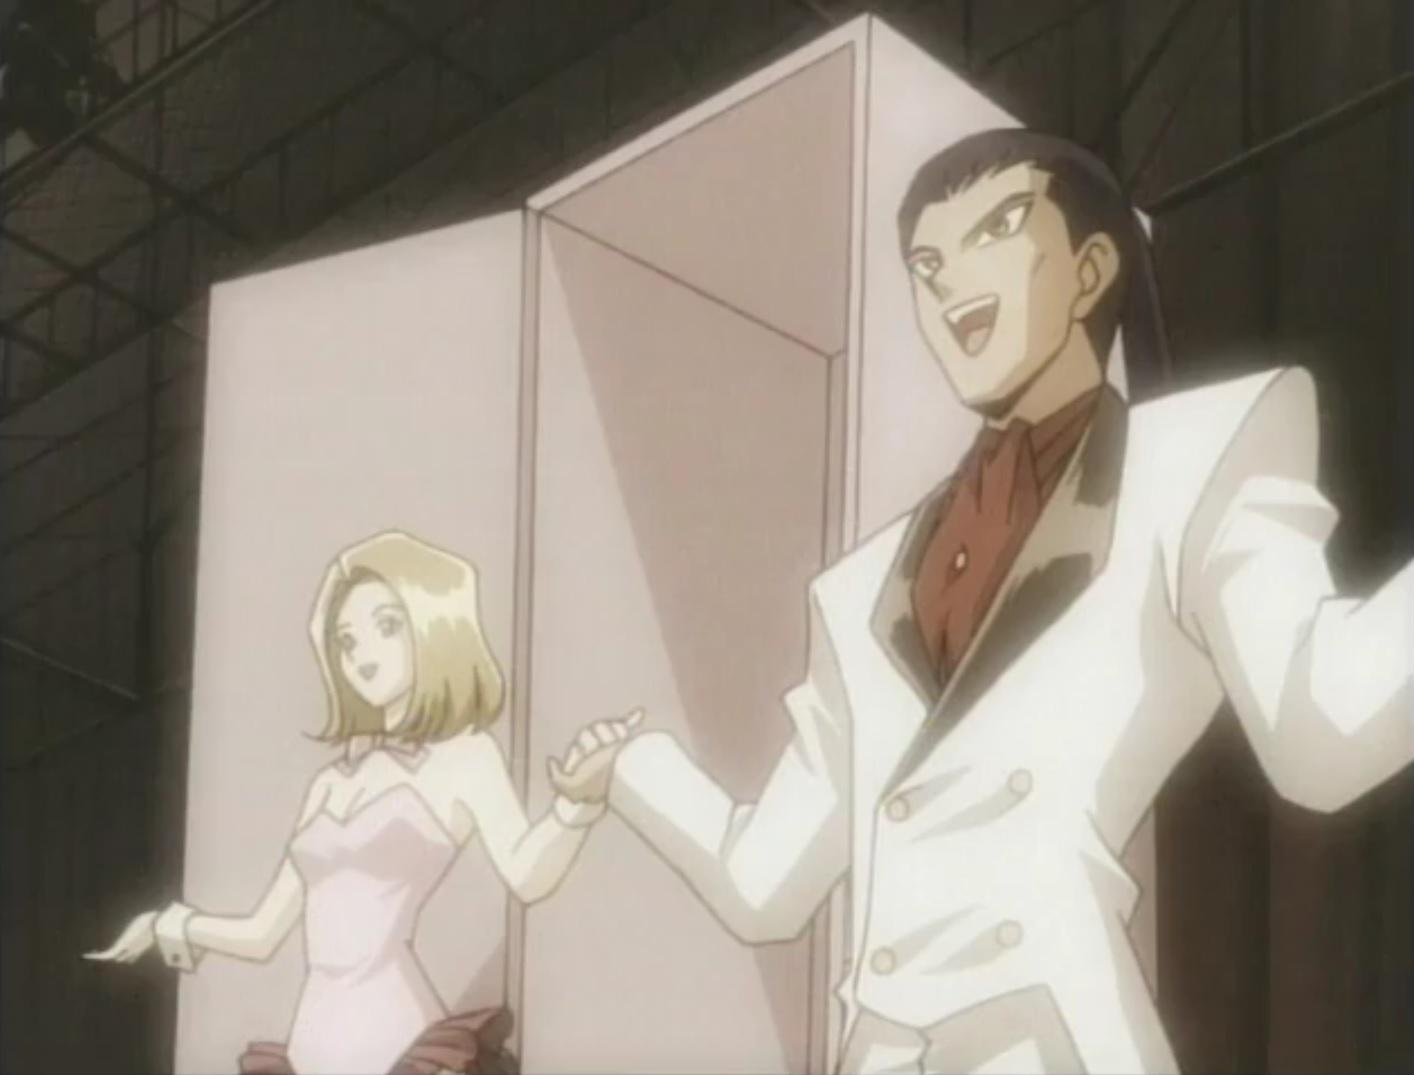 File:Arkana and Catherine performing.jpg